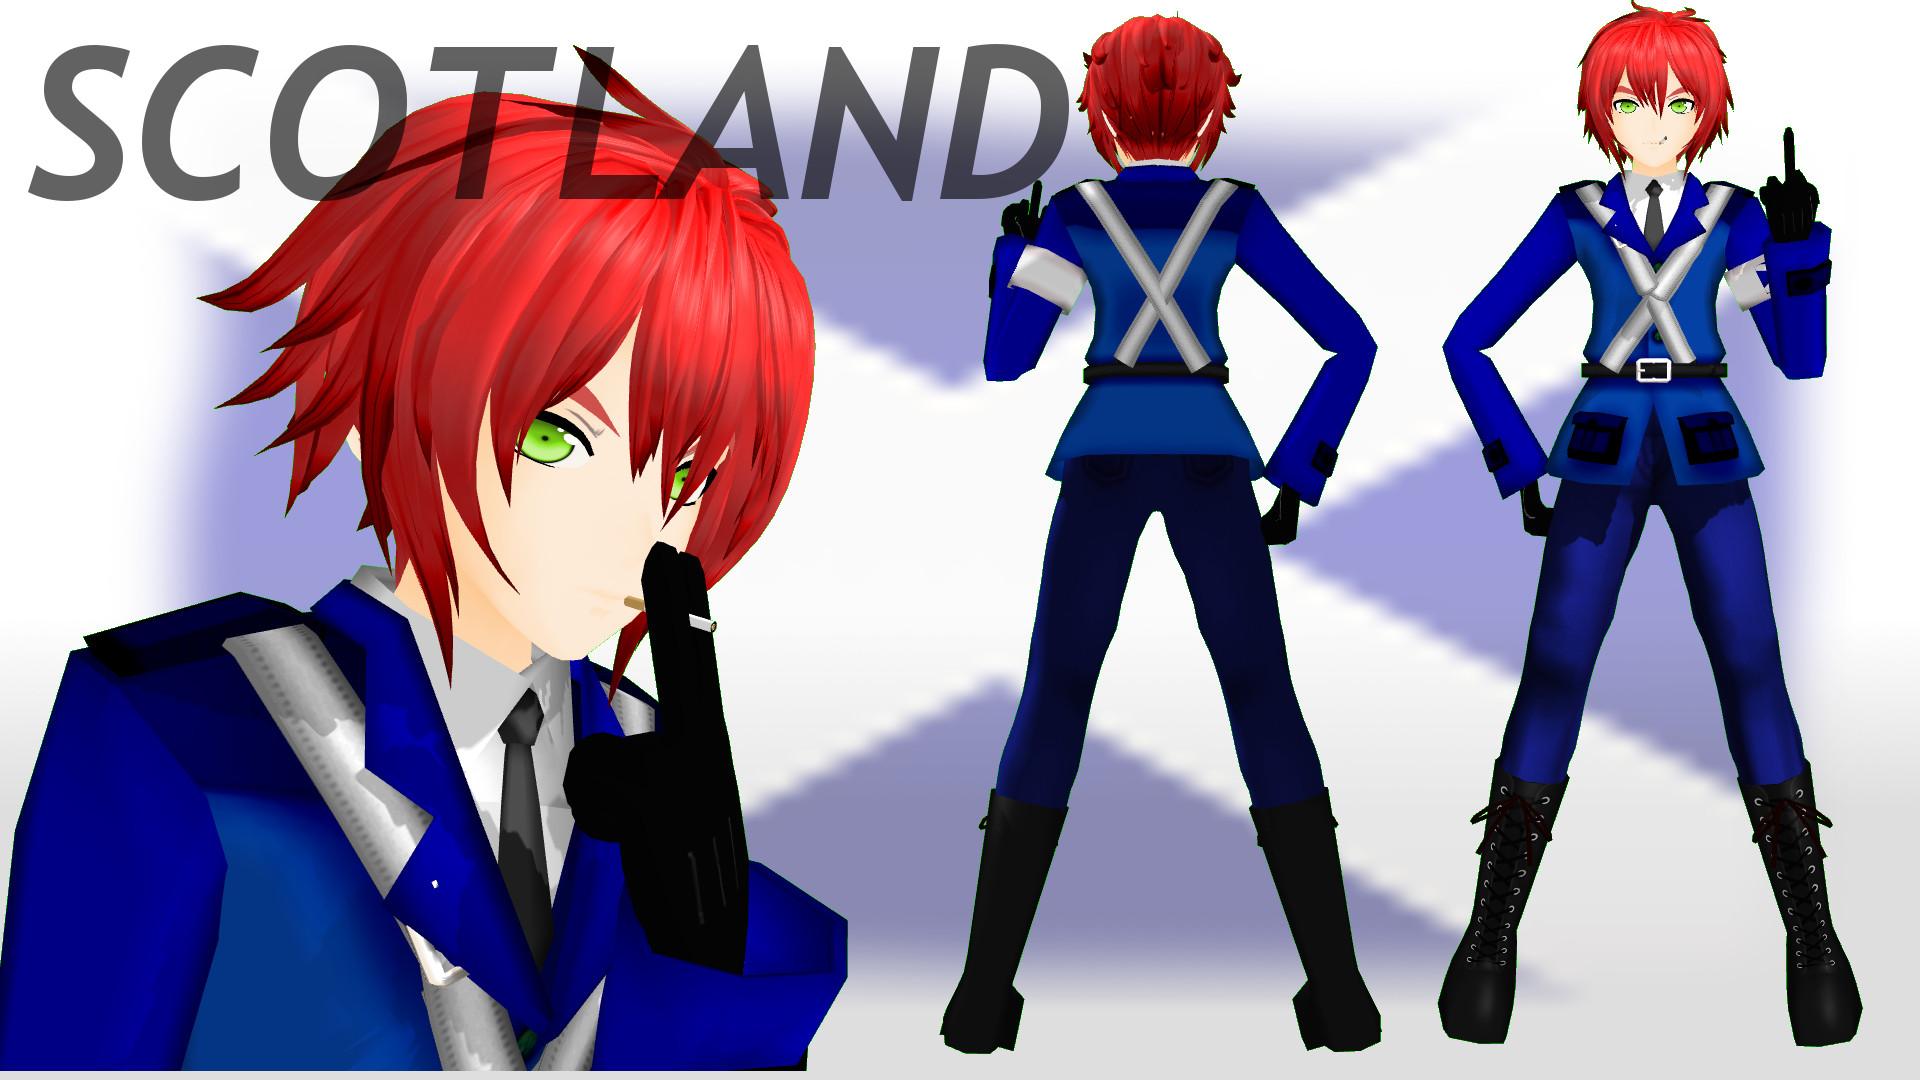 MMD Hetalia Scotland! DL by PrincessSushiCat